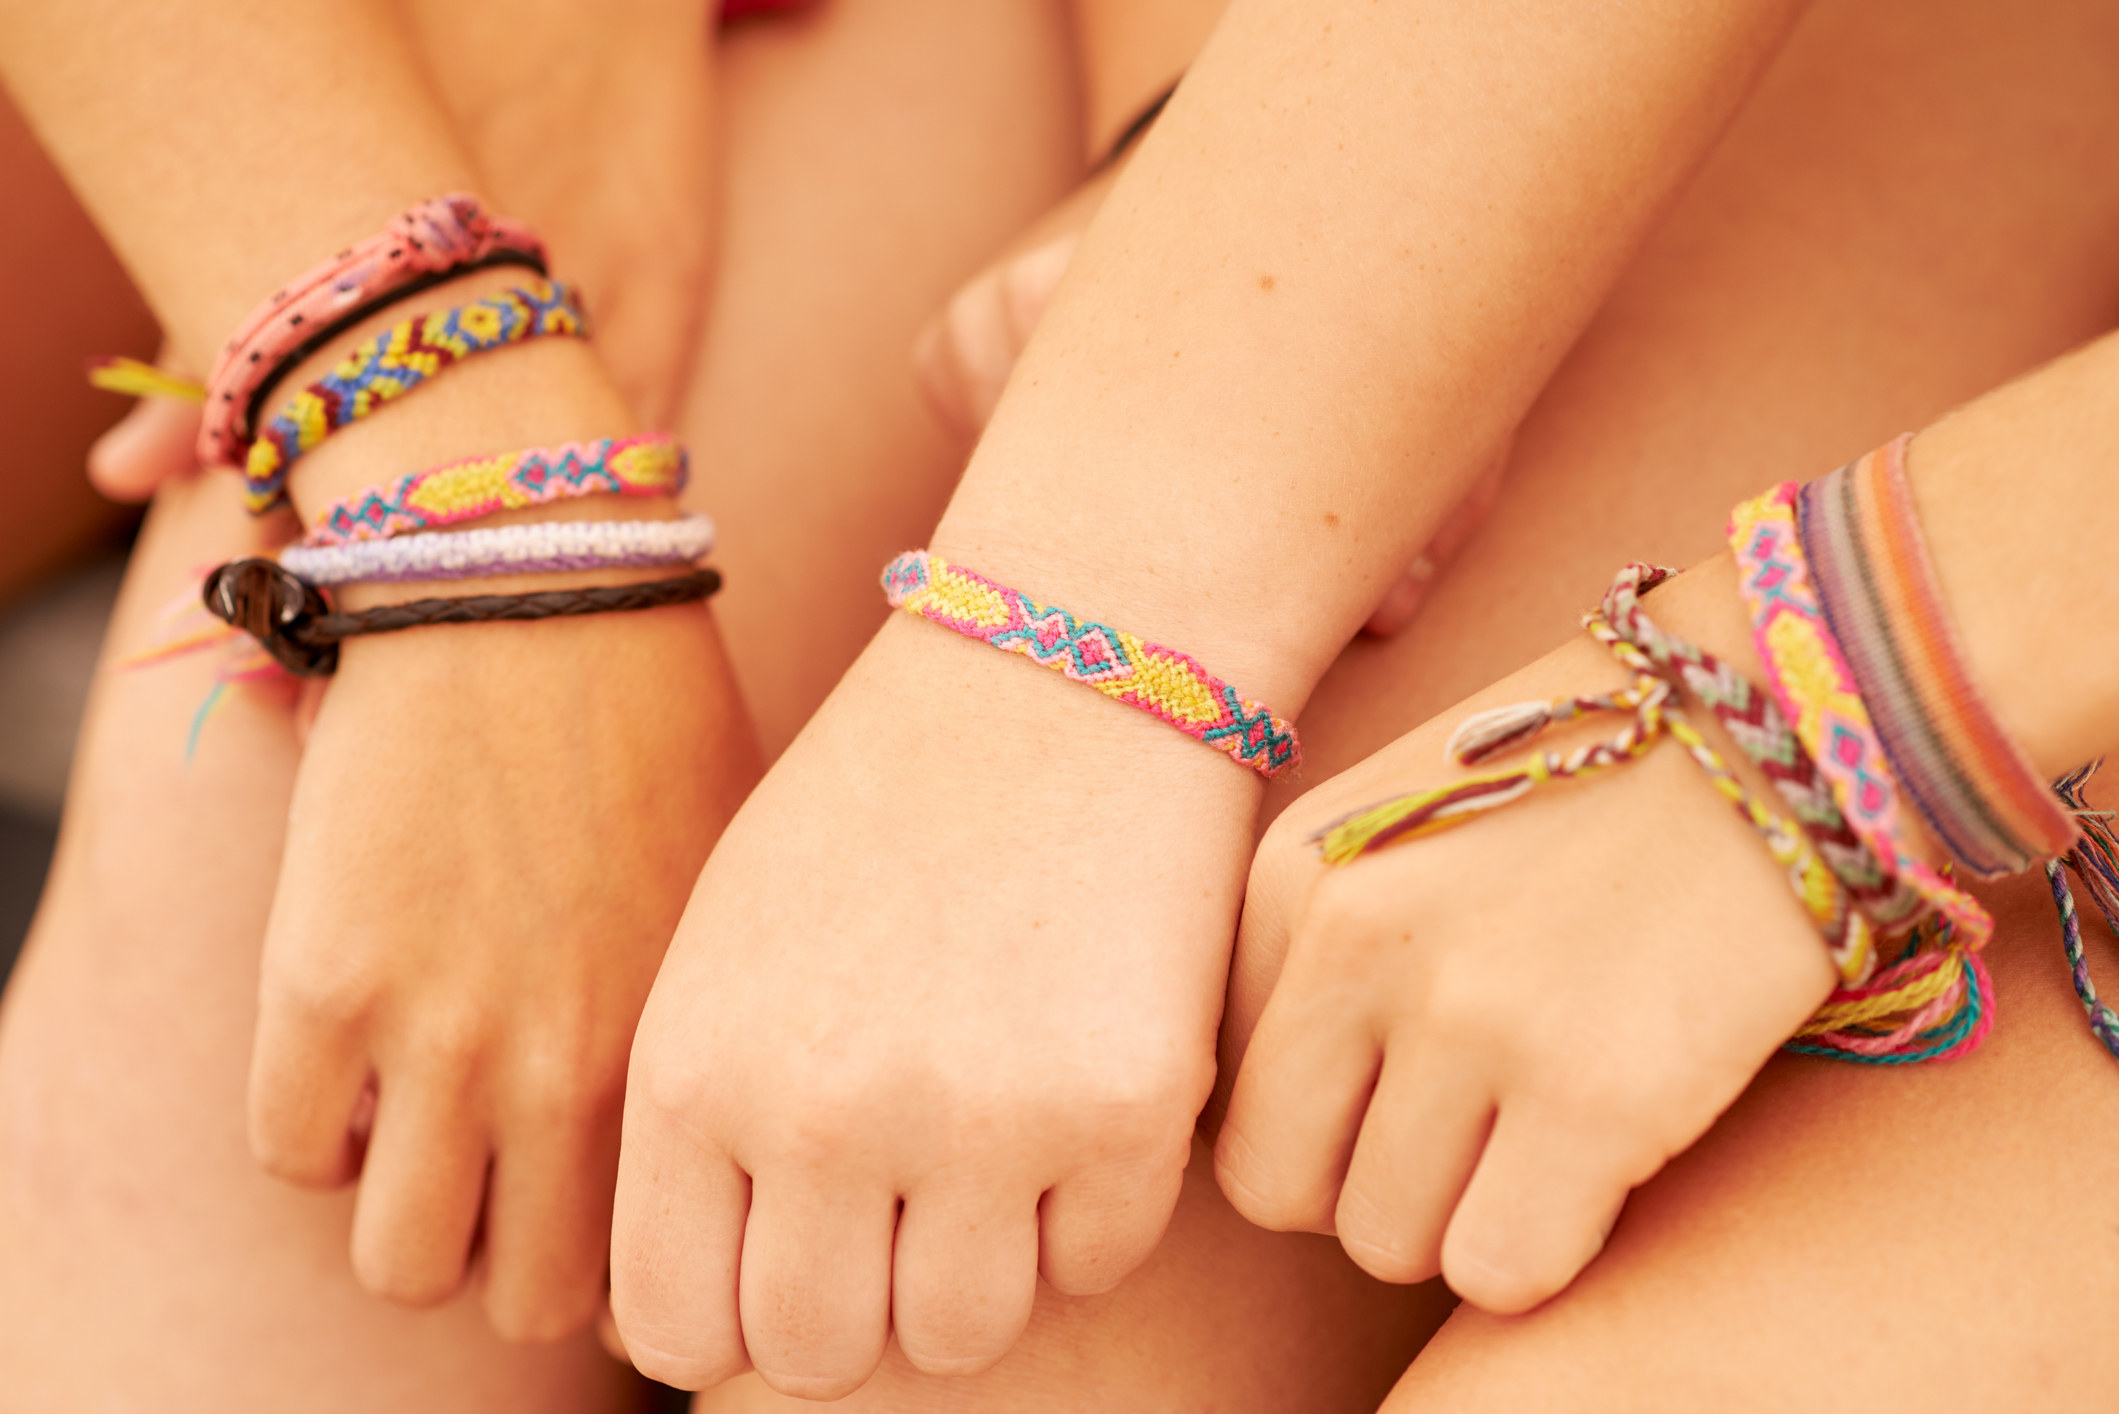 Three kids showing off their friendship bracelets